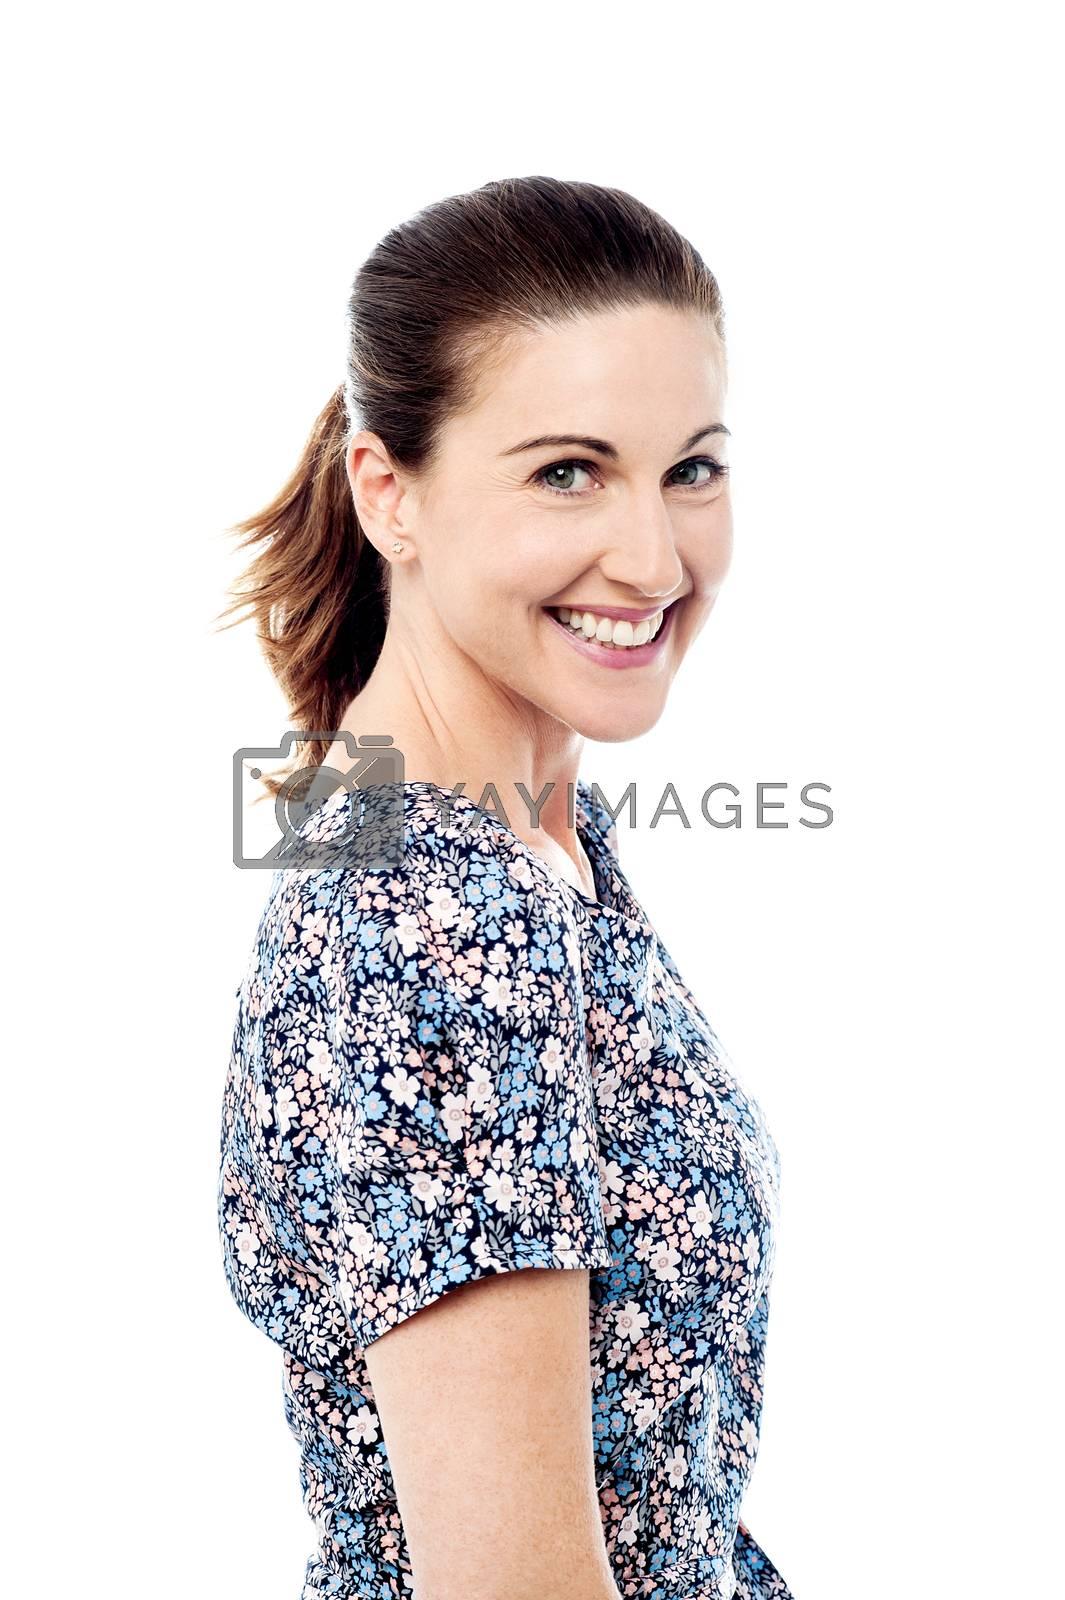 Side pose smiling woman looking at camera.